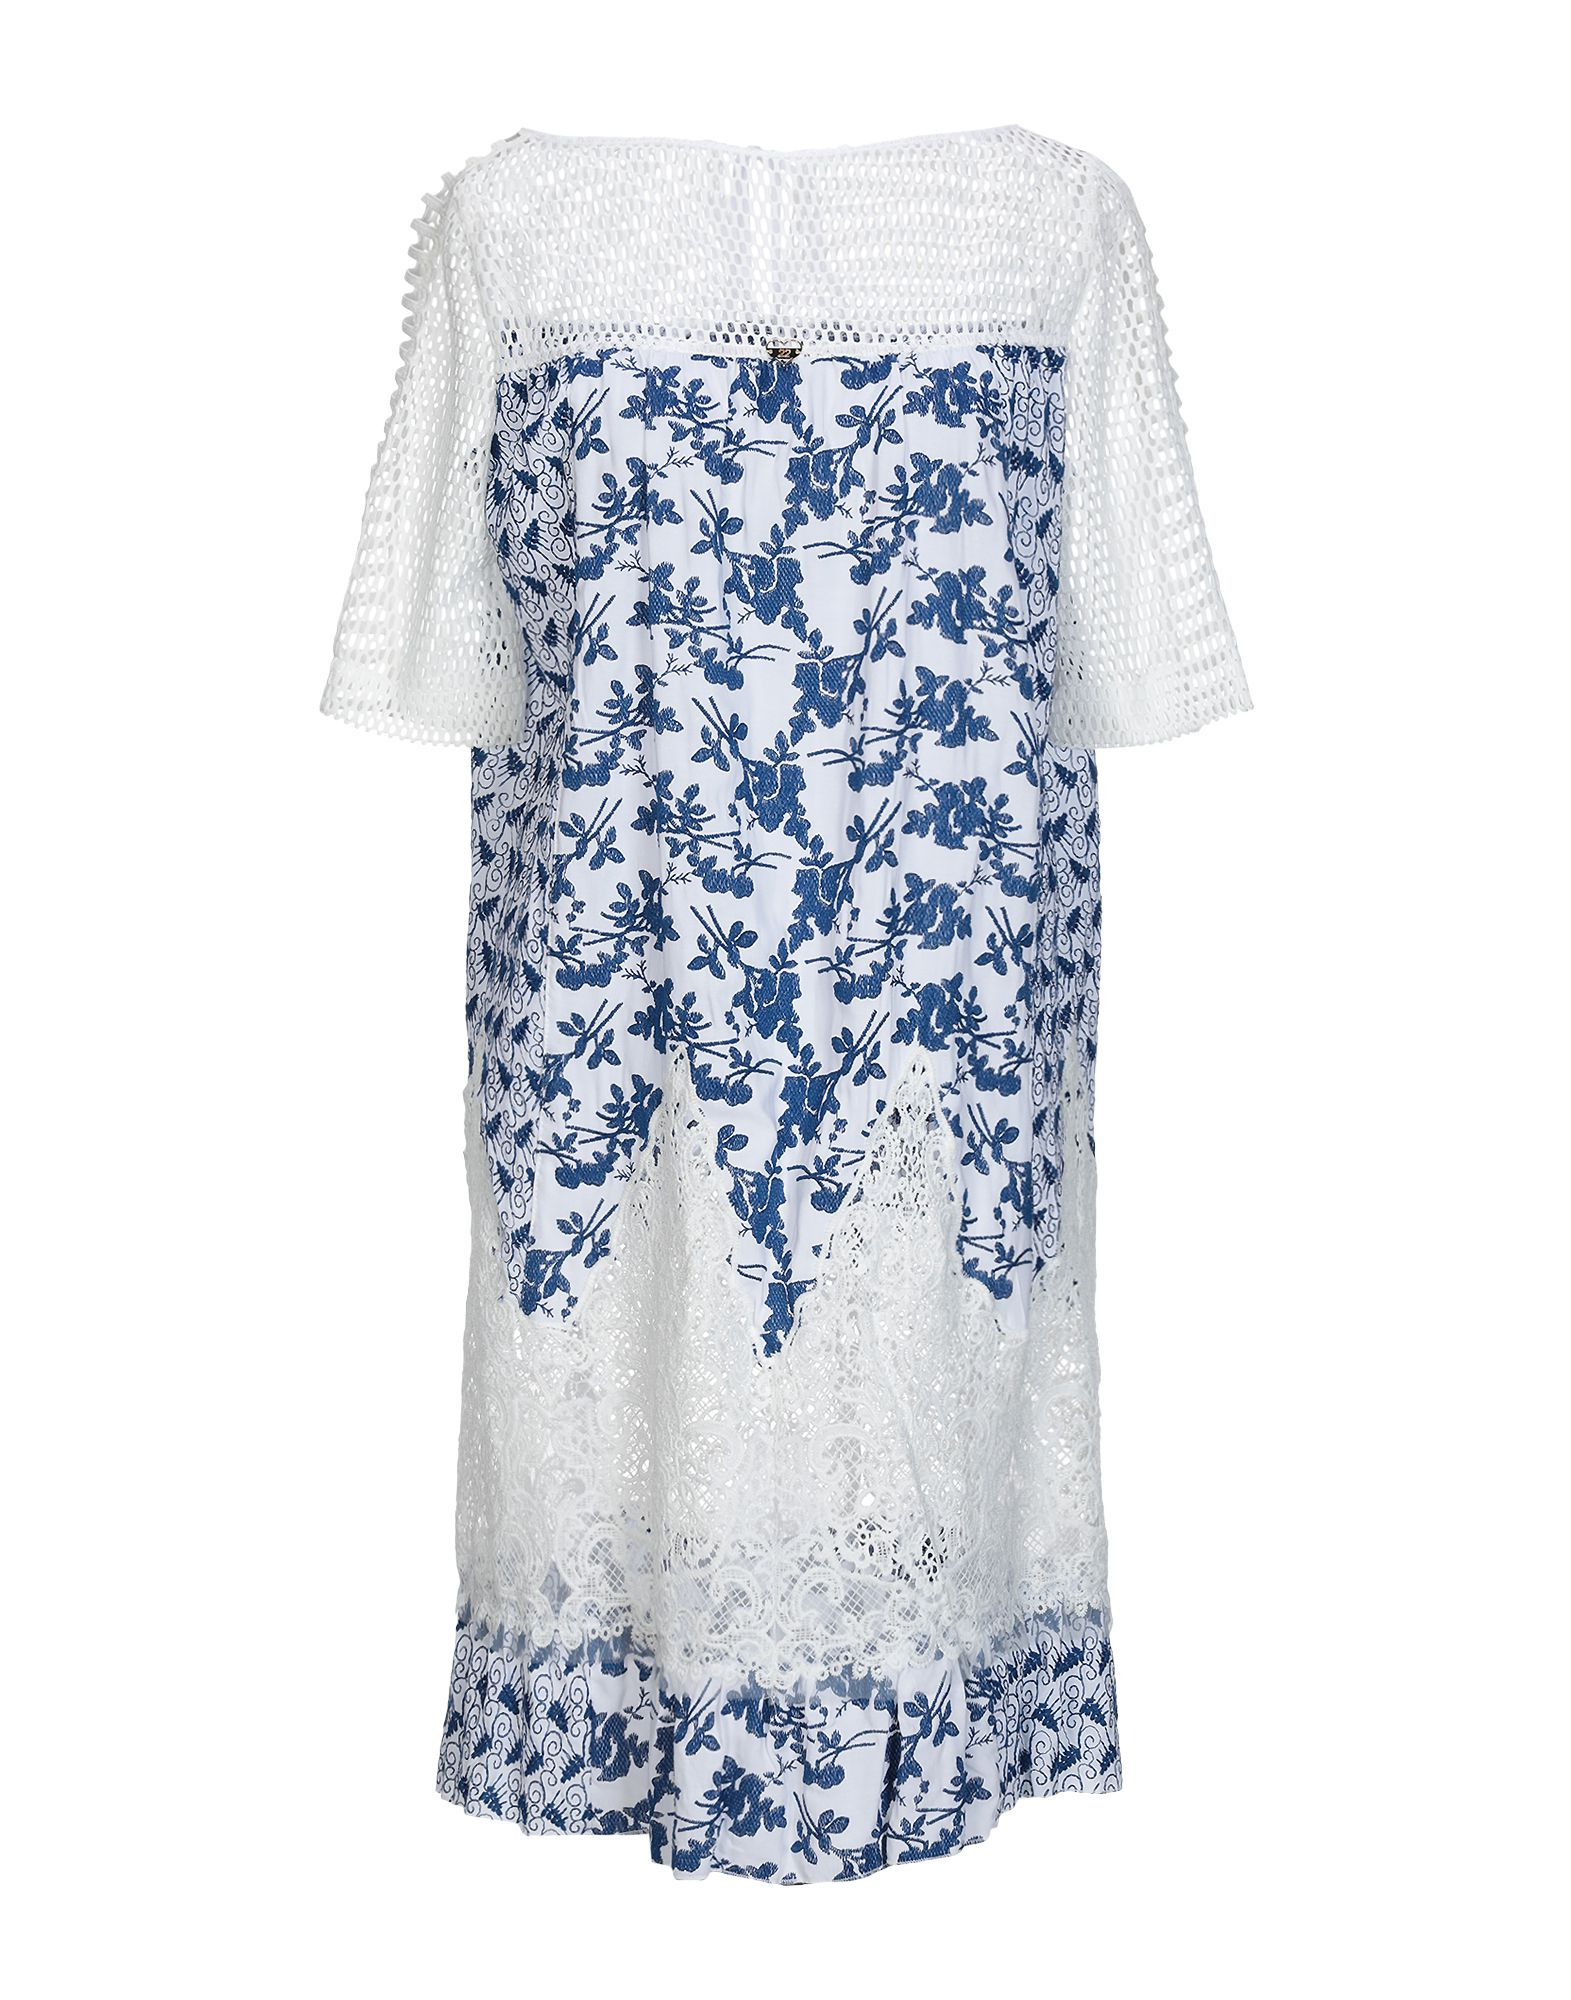 22 MAGGIO by MARIA GRAZIA SEVERI Короткое платье